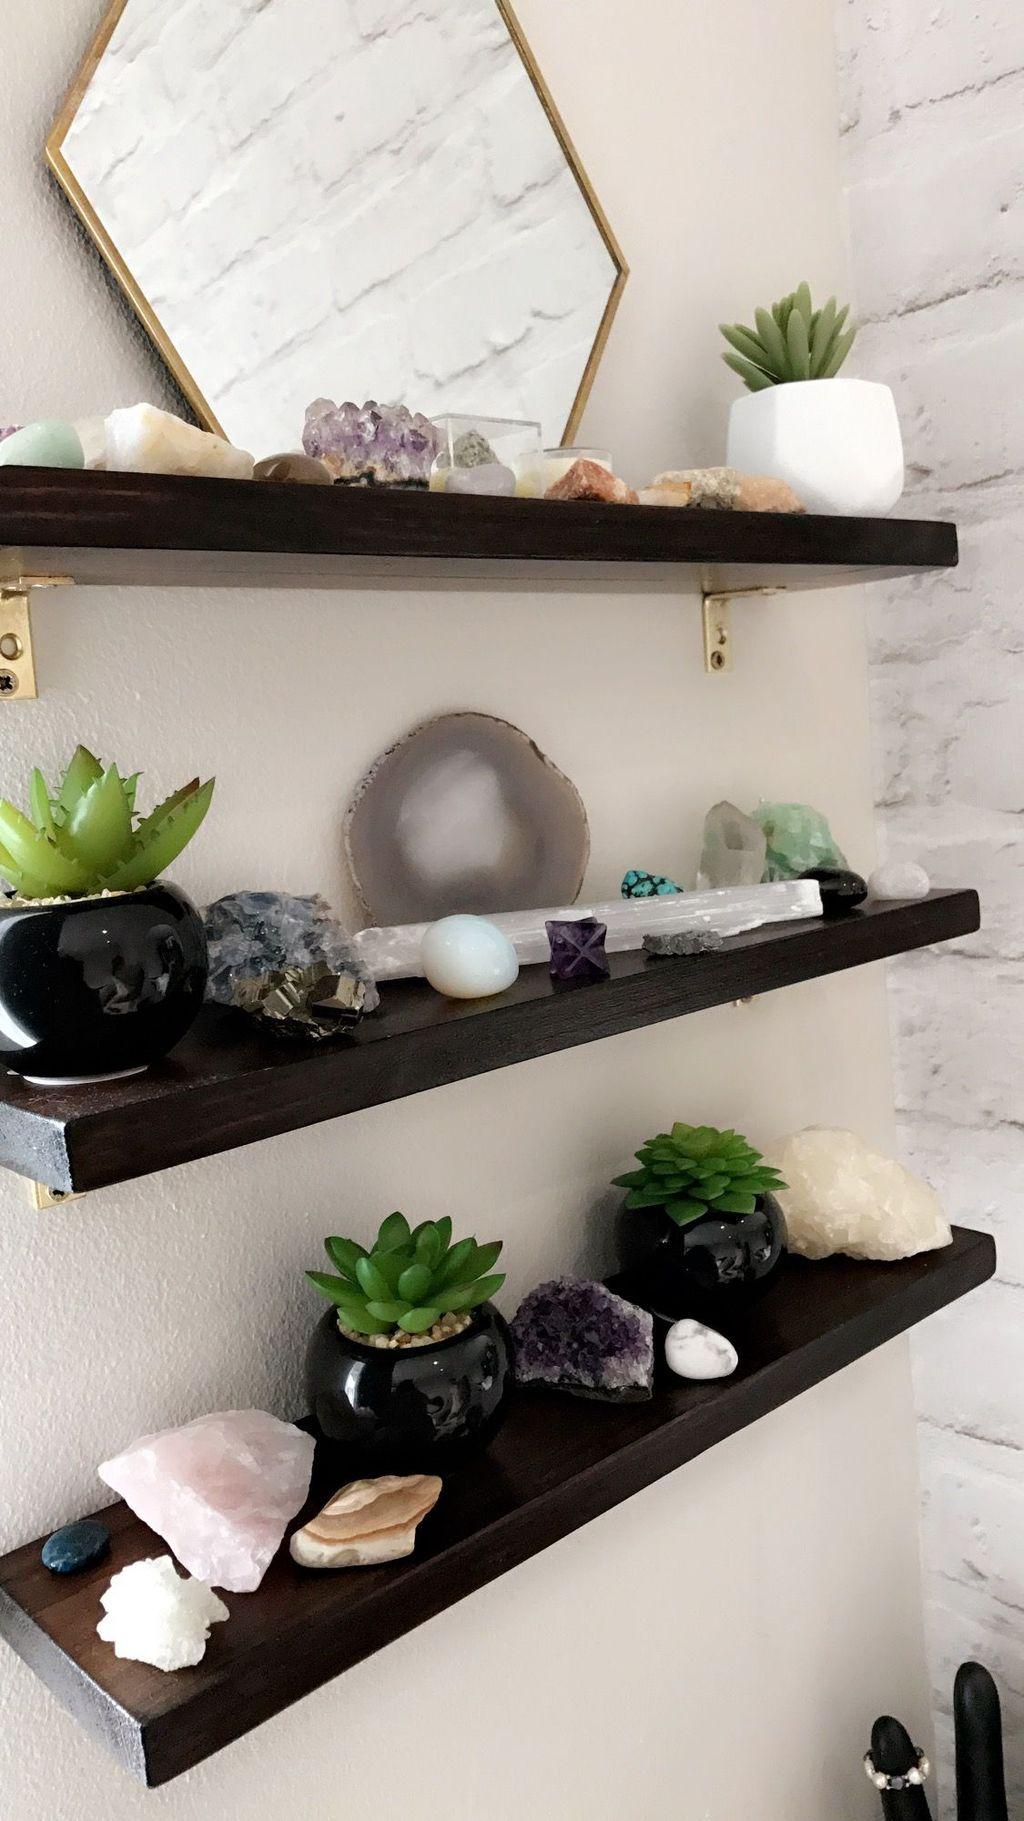 Crystal Decor For Your Living Room Home Decor Inspiration Zen Decor Floating Shelves Diy